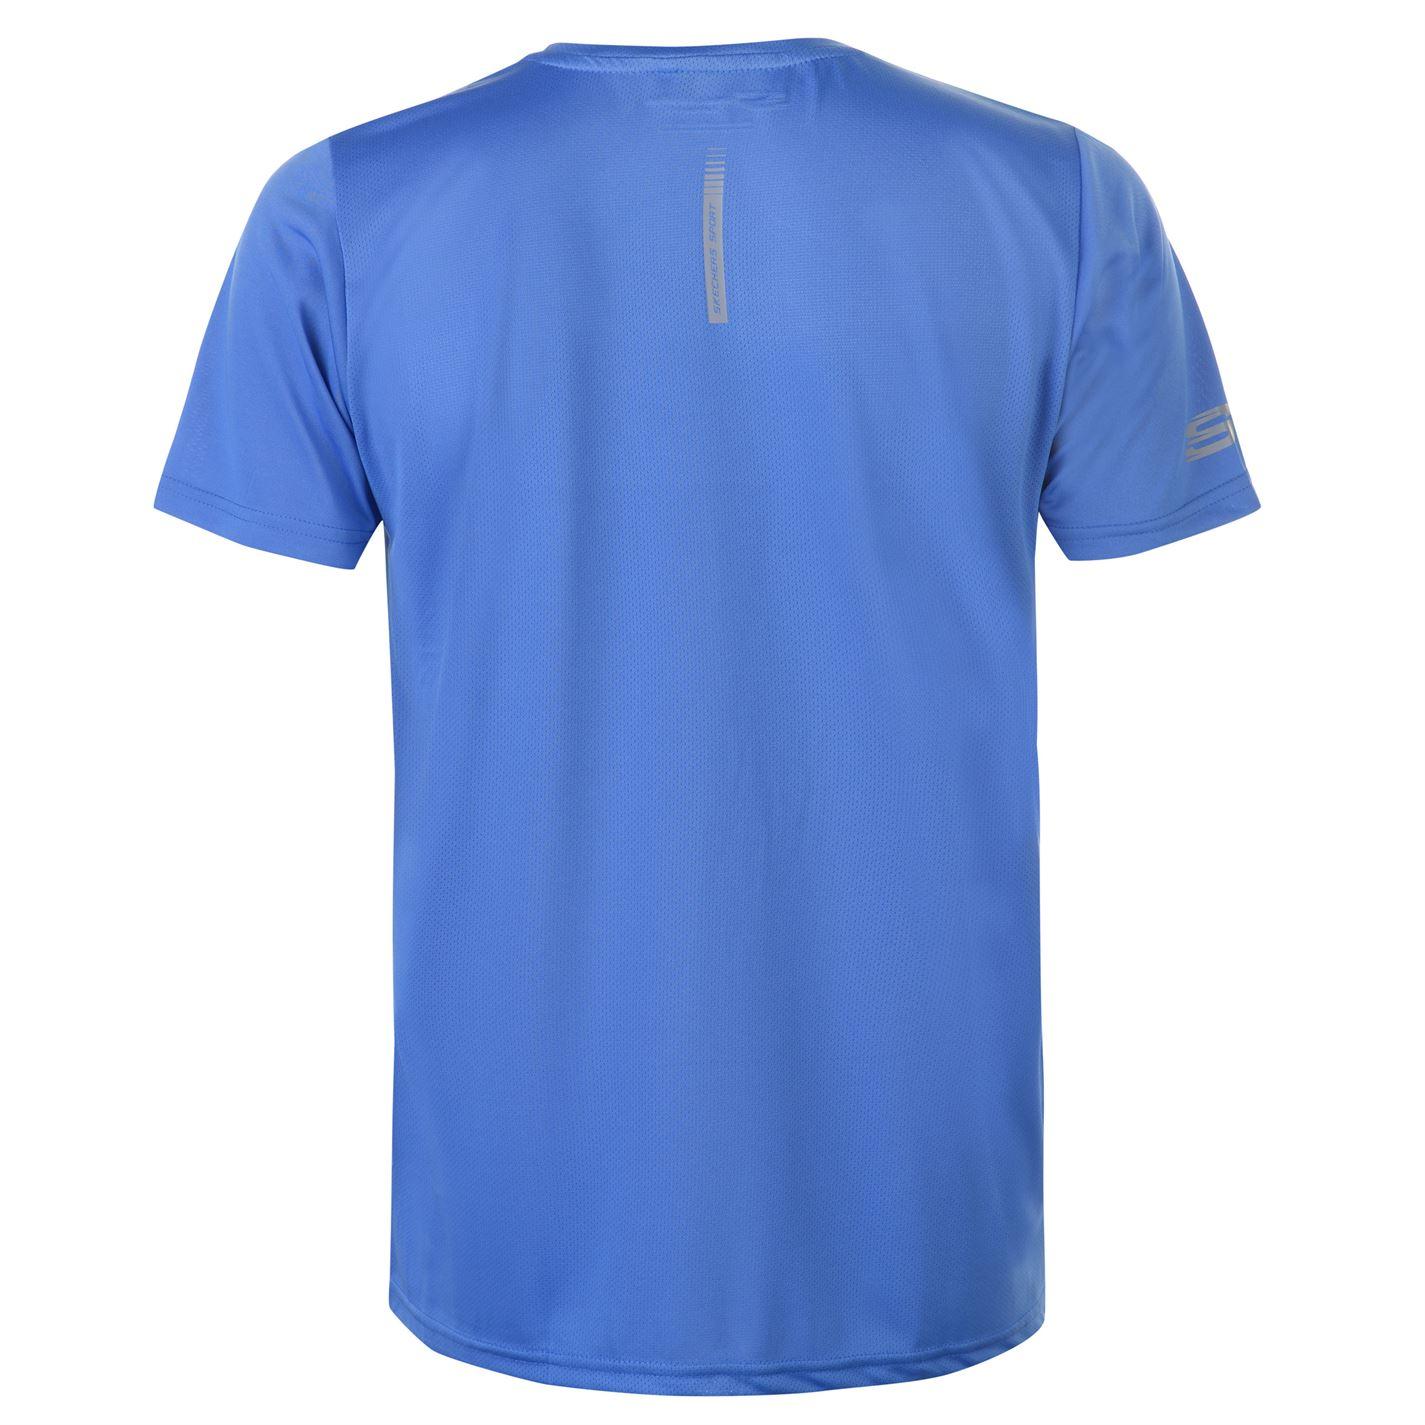 Skechers-Mens-Rendimiento-Grafico-camiseta-Manga-Corta-Camiseta-Top-Cuello-Redondo miniatura 12